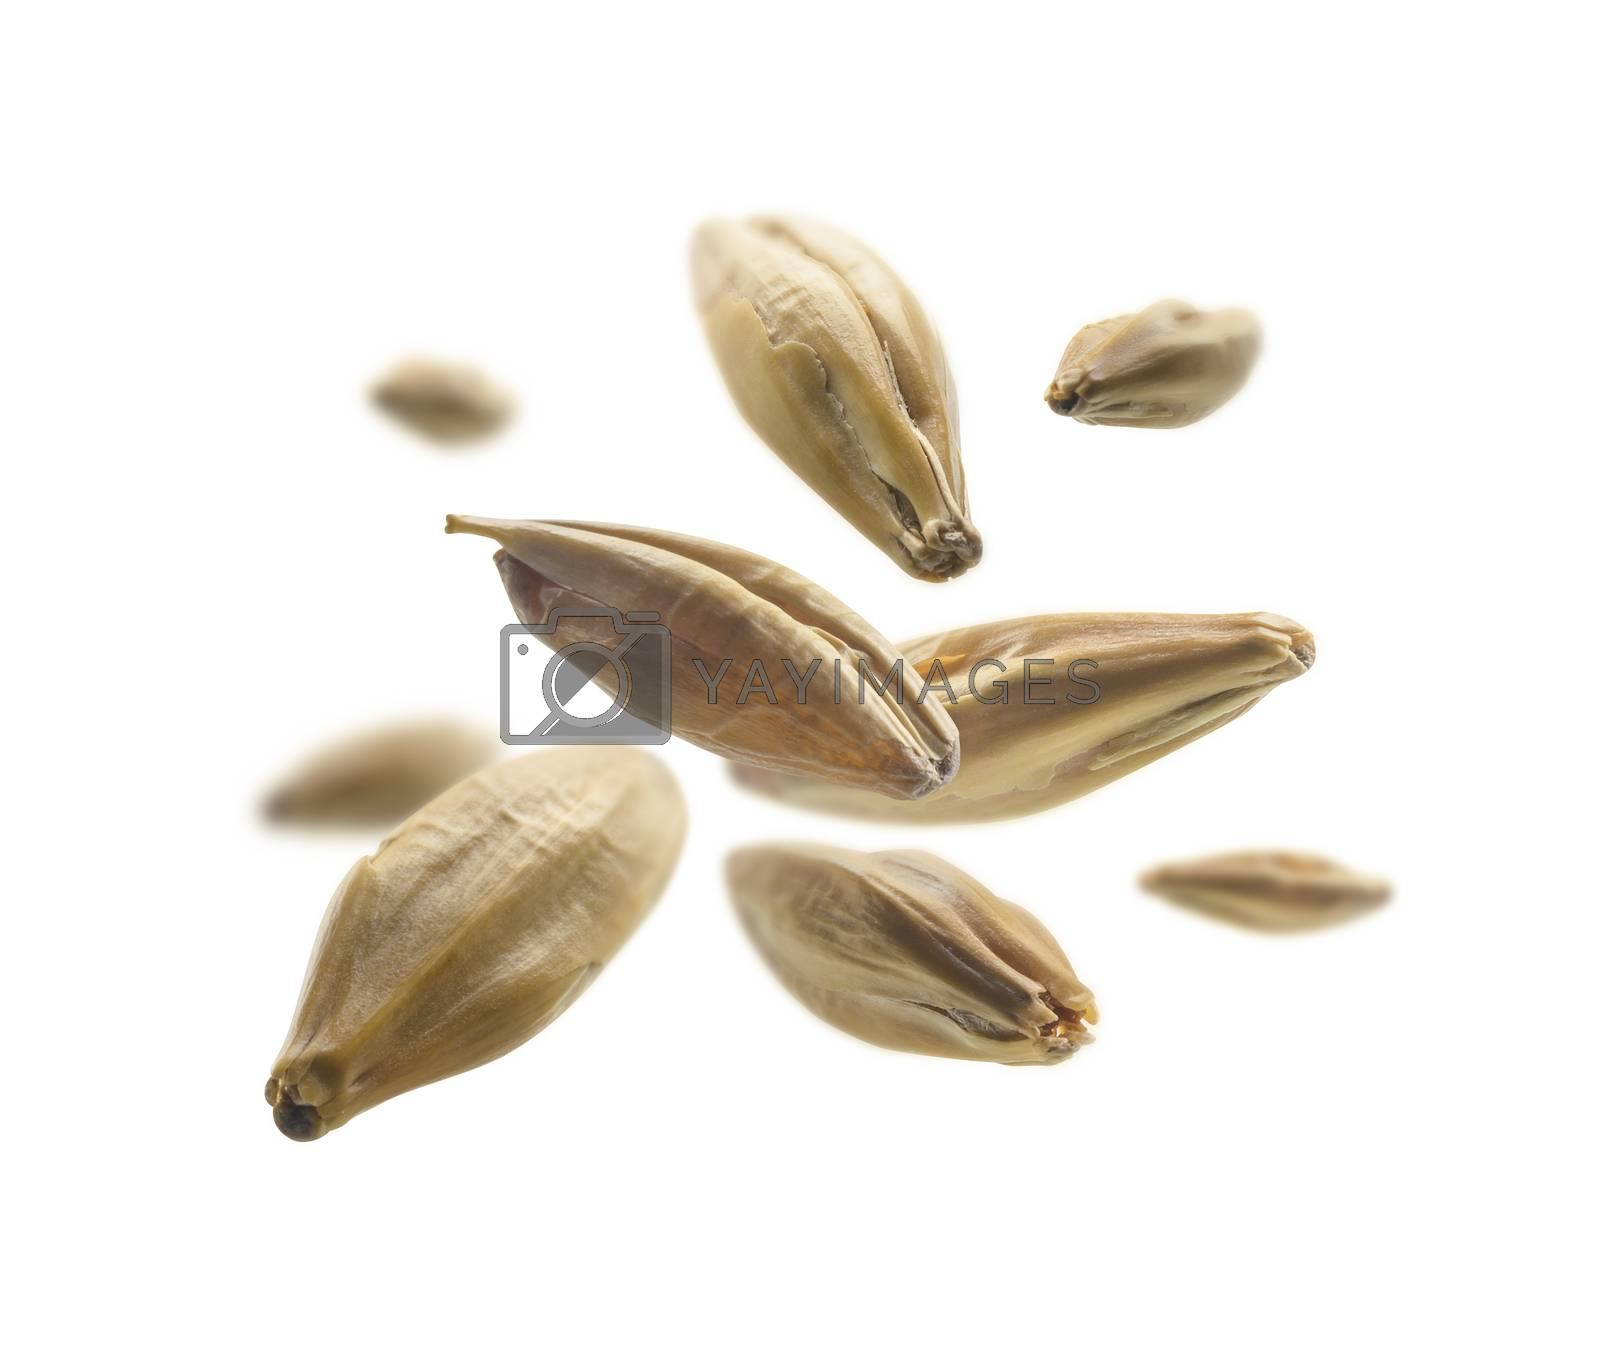 Barley malt grains levitate on a white background.